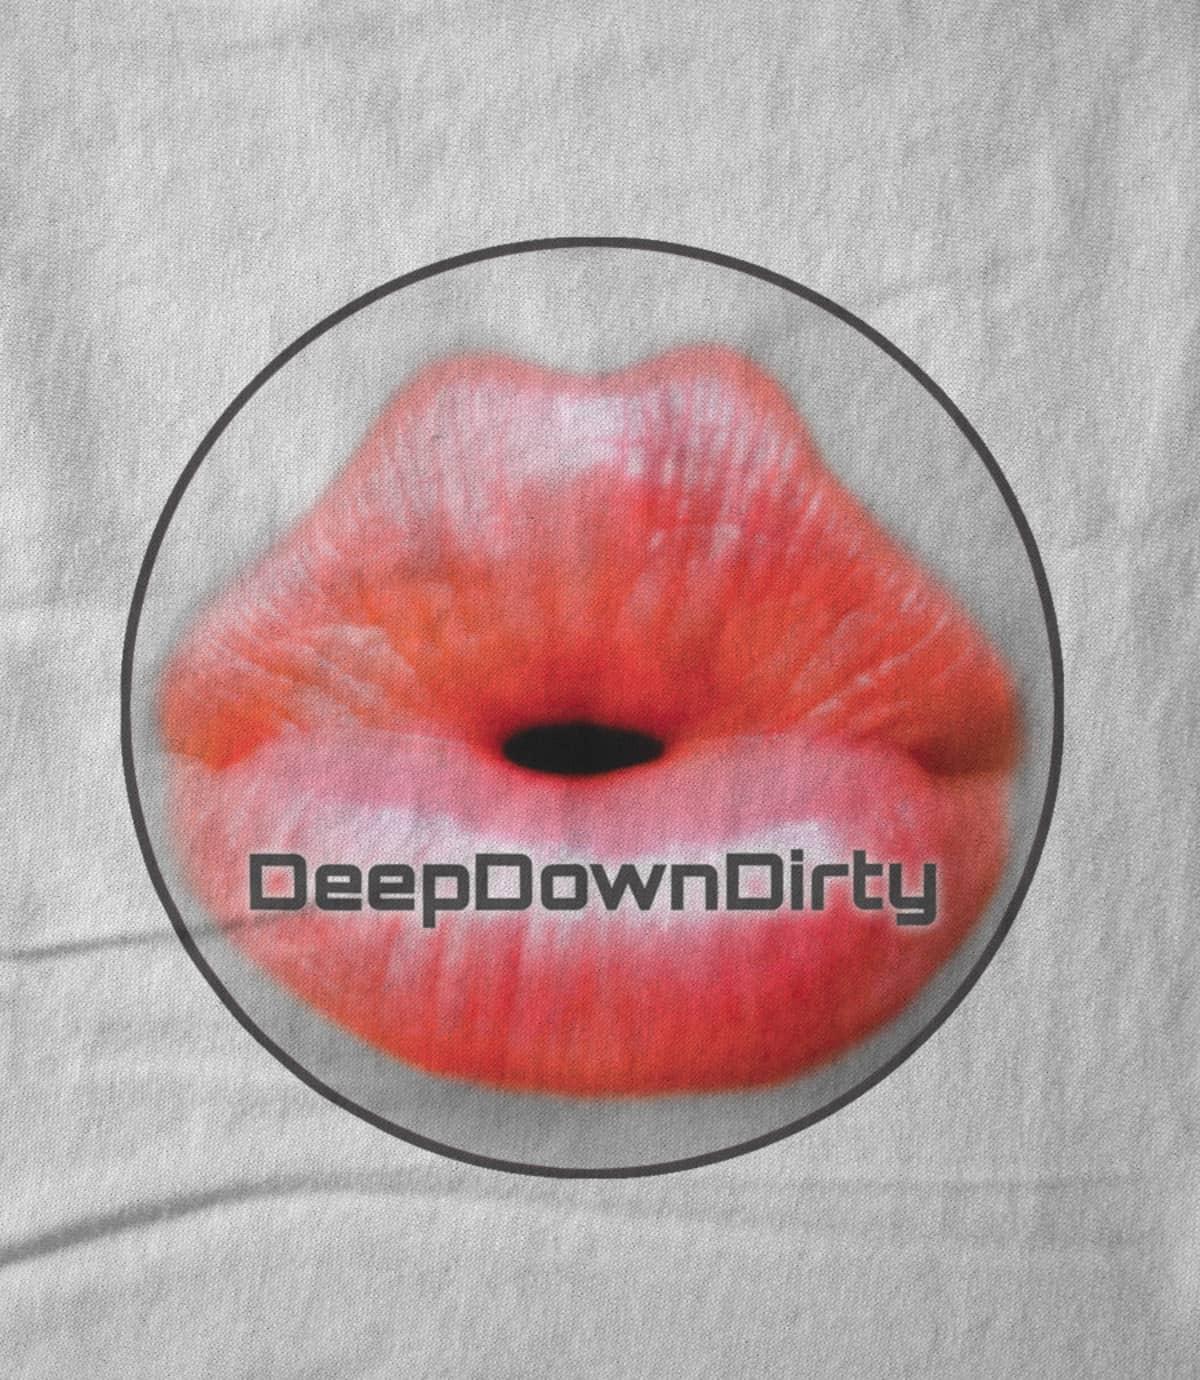 DeepDownDirty Record Label